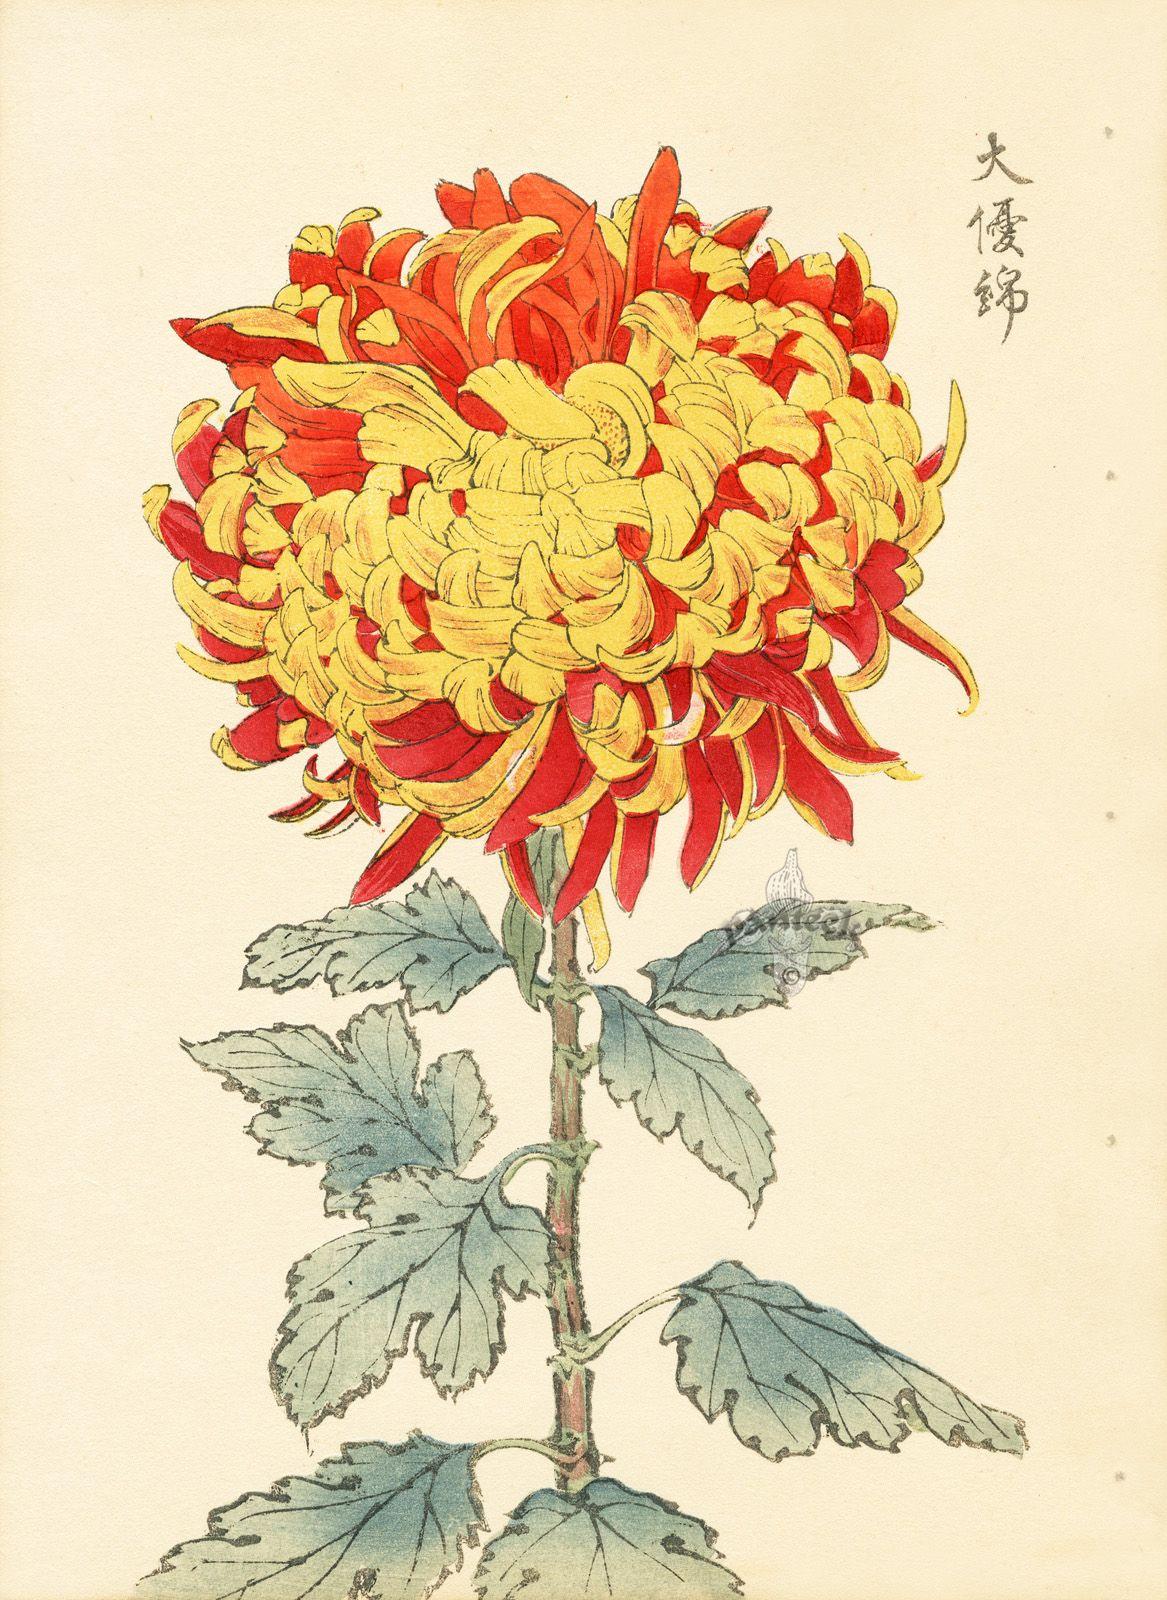 Keika Hasegawa Chrysanthemum Wood Block Prints 1893 Kunst Ideen Japanische Malerei Botanische Illustration